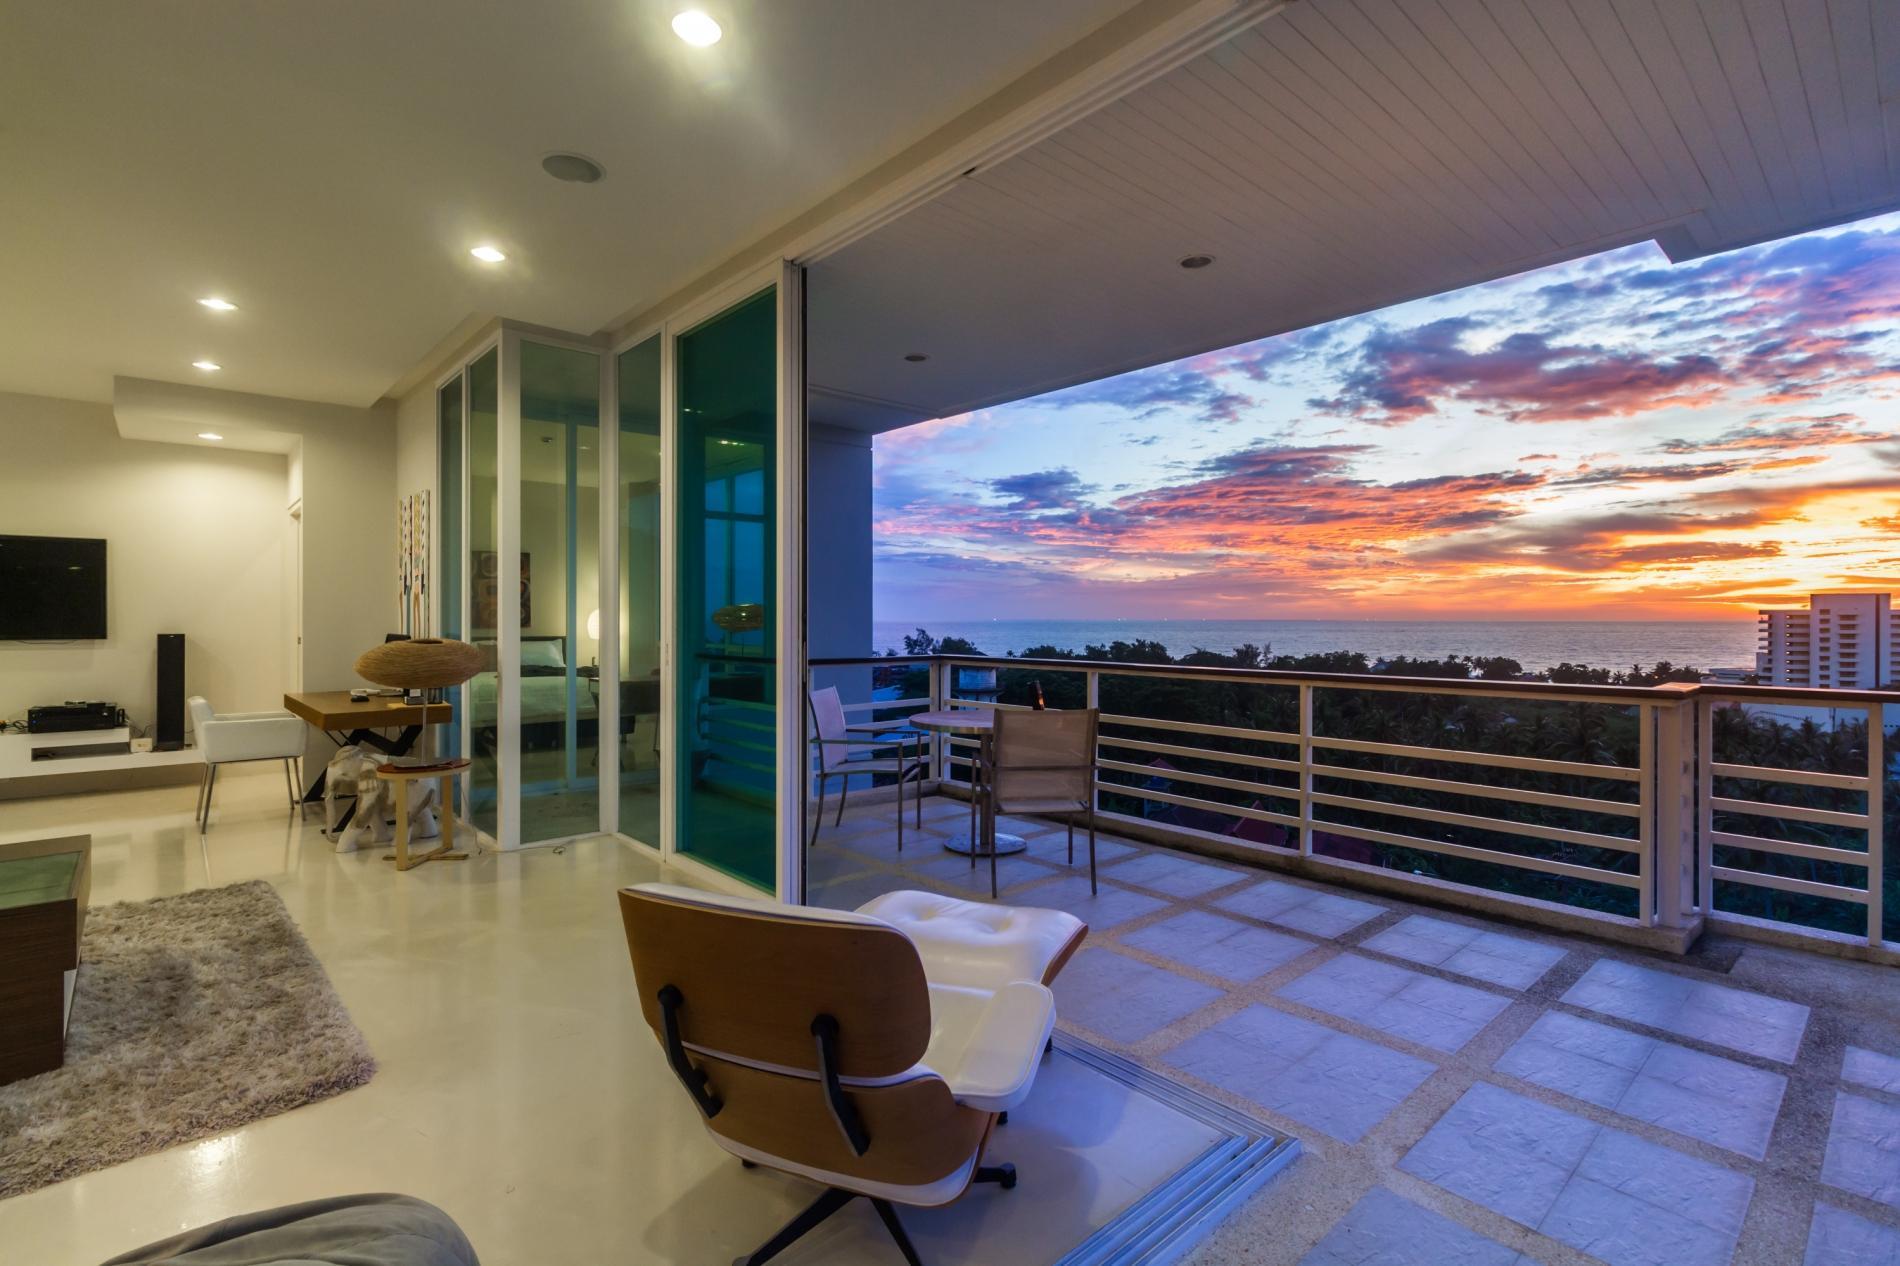 Apartment KH2605 - Sea-view Penthouse in Karon  walk to beach  restaurants  bars  shops photo 20179429